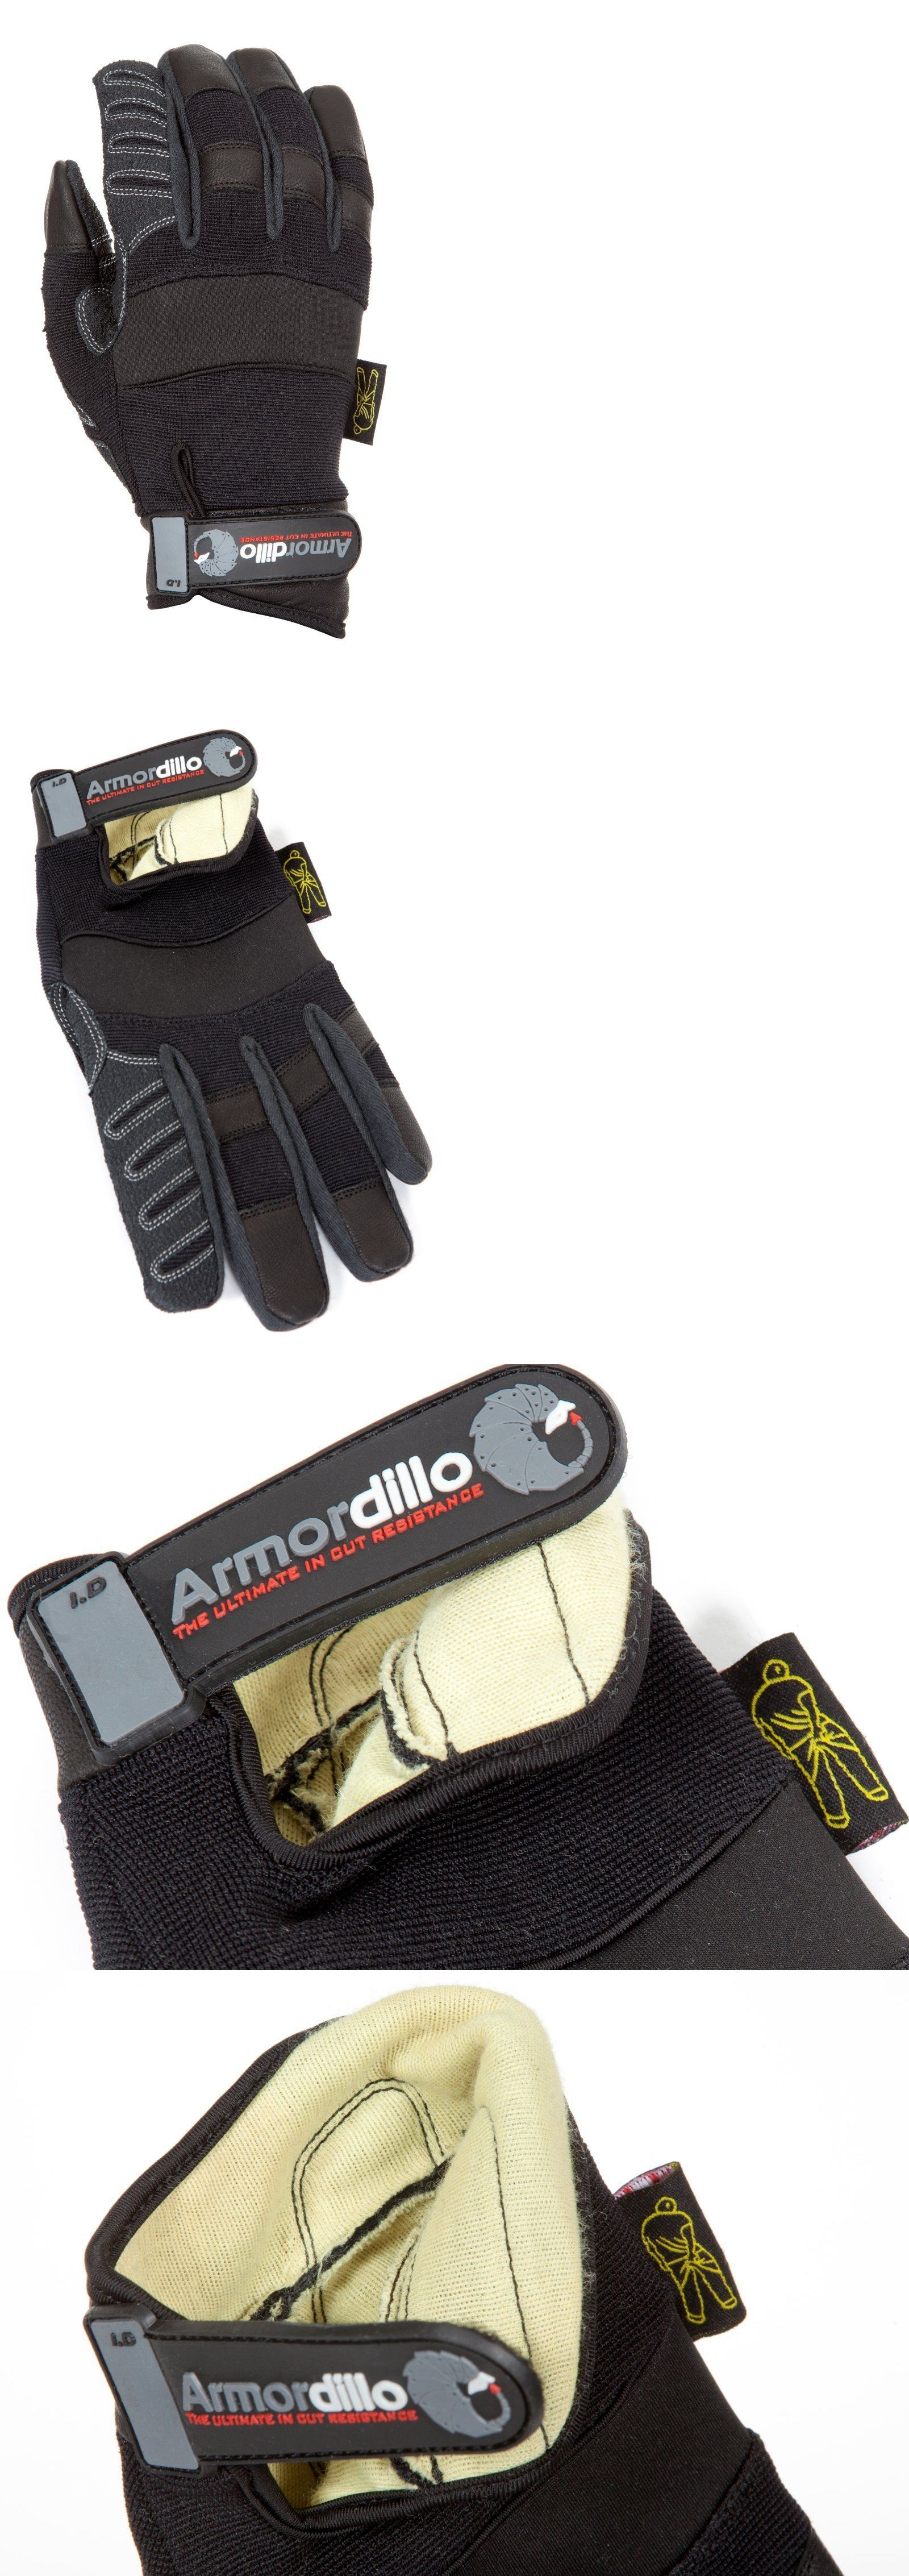 Dirty Rigger Armordillo Cut Resistant Glove Work Theater Shop Club Sheet Metal